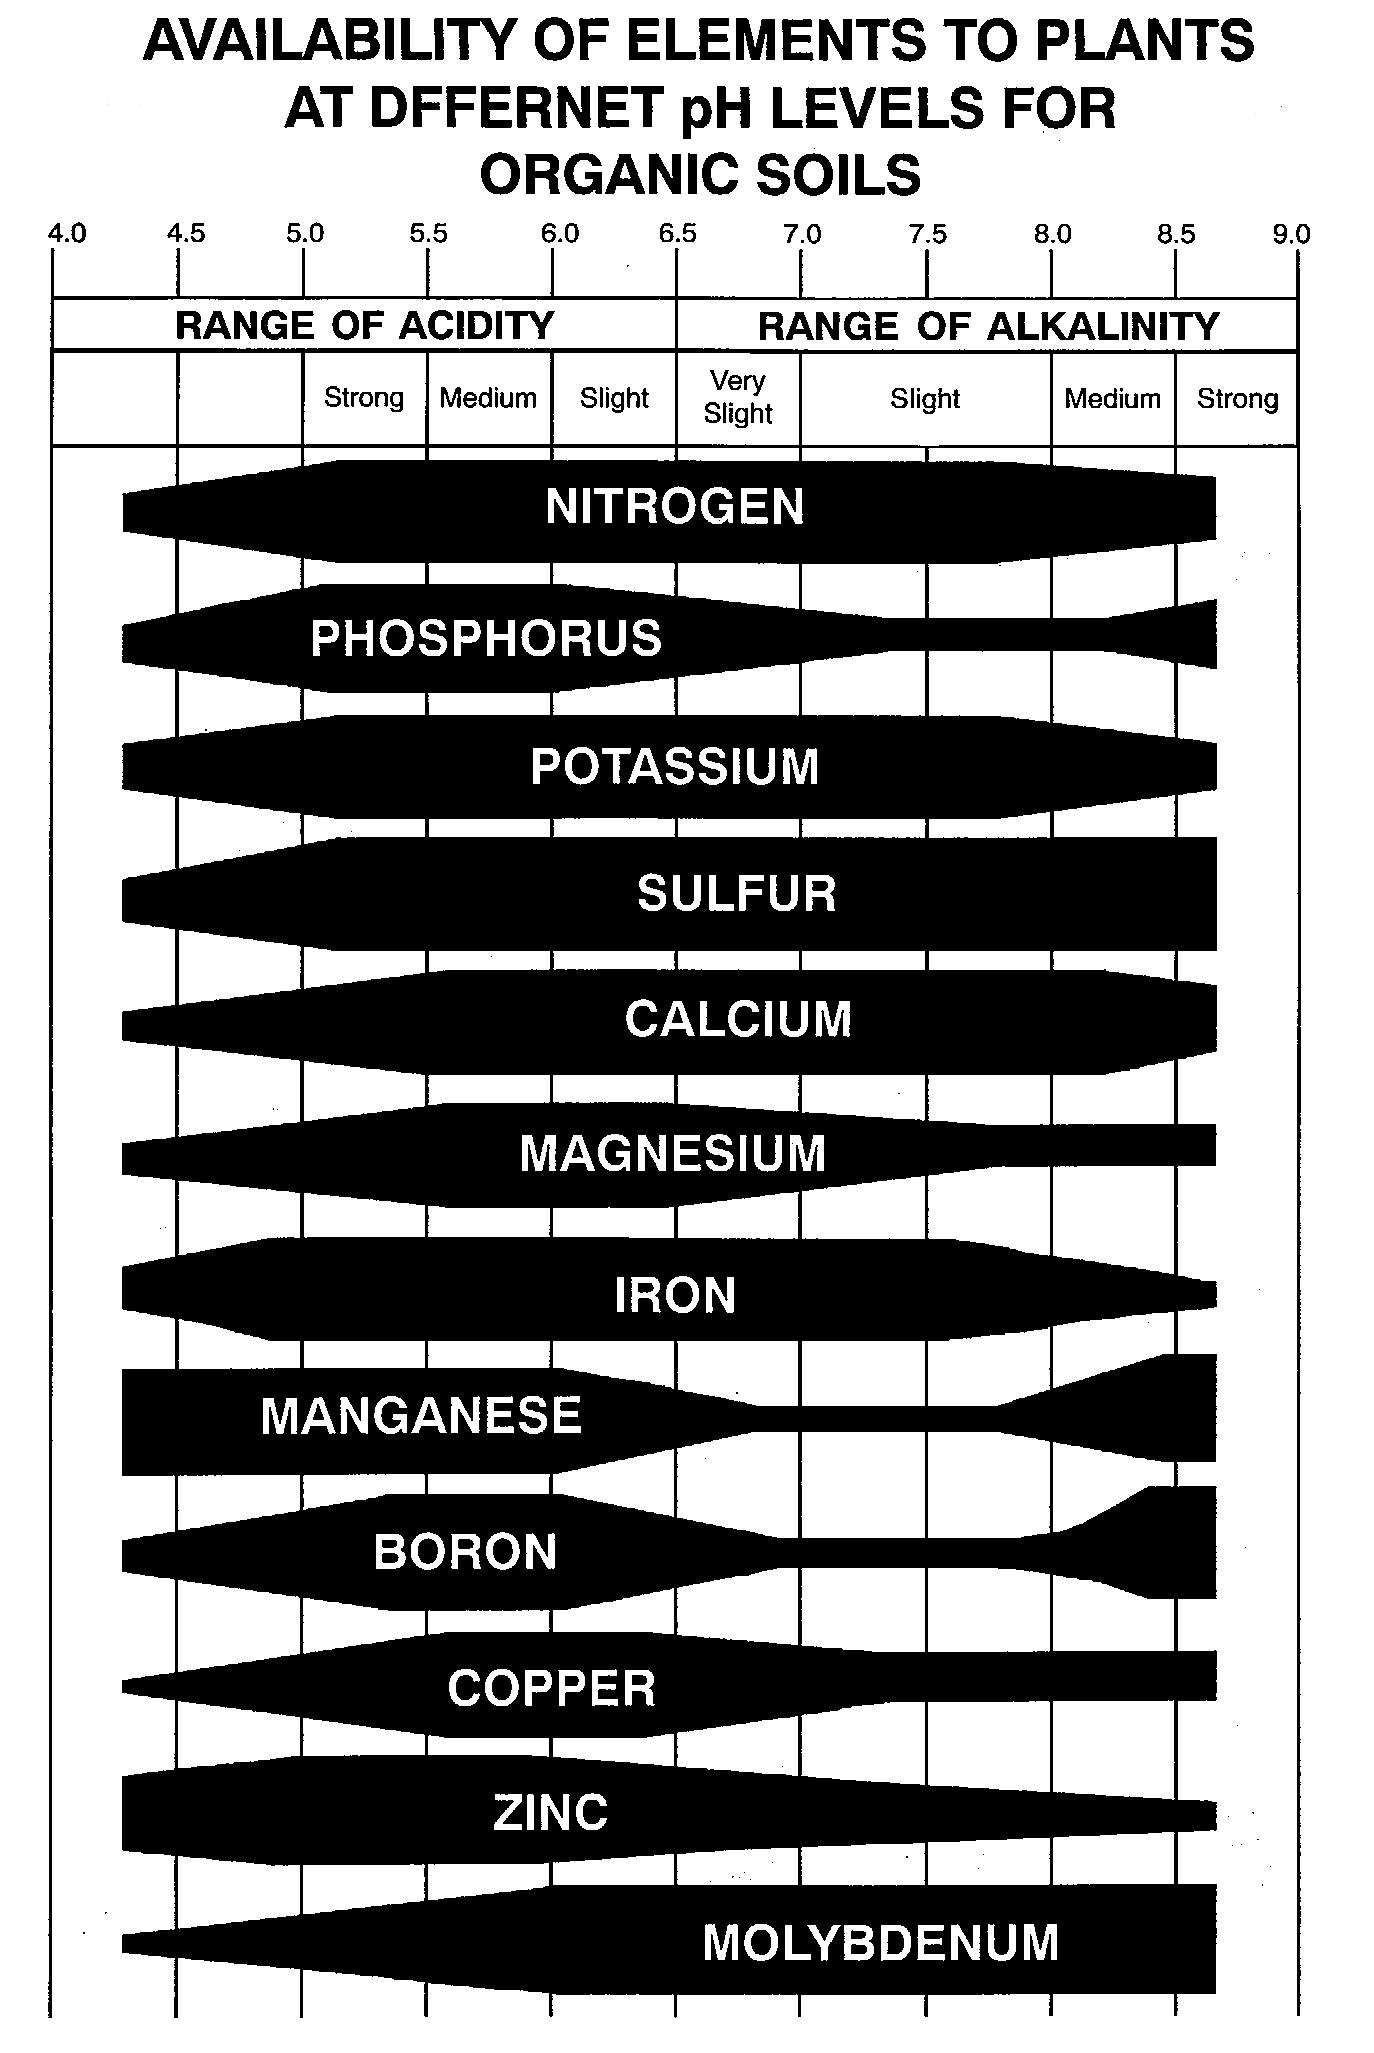 nutrient_availability_soil_ph_organic_soils.jpg